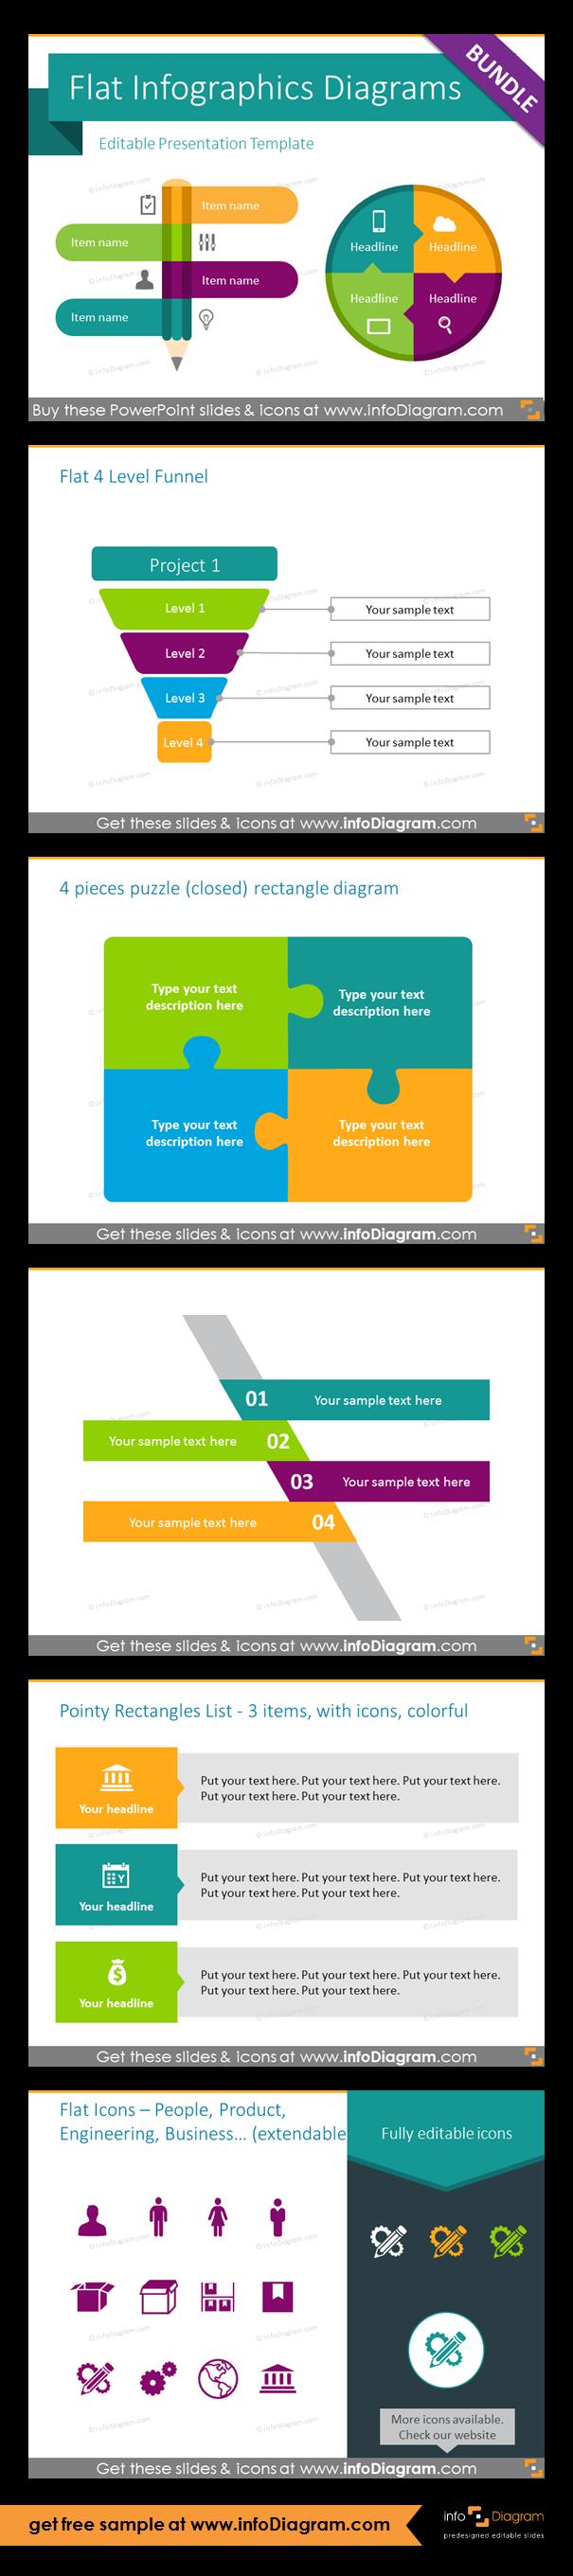 Infographics powerpoint templates with modern flat design editable infographics powerpoint templates with modern flat design editable diagrams and vector icons flat 4 level toneelgroepblik Gallery